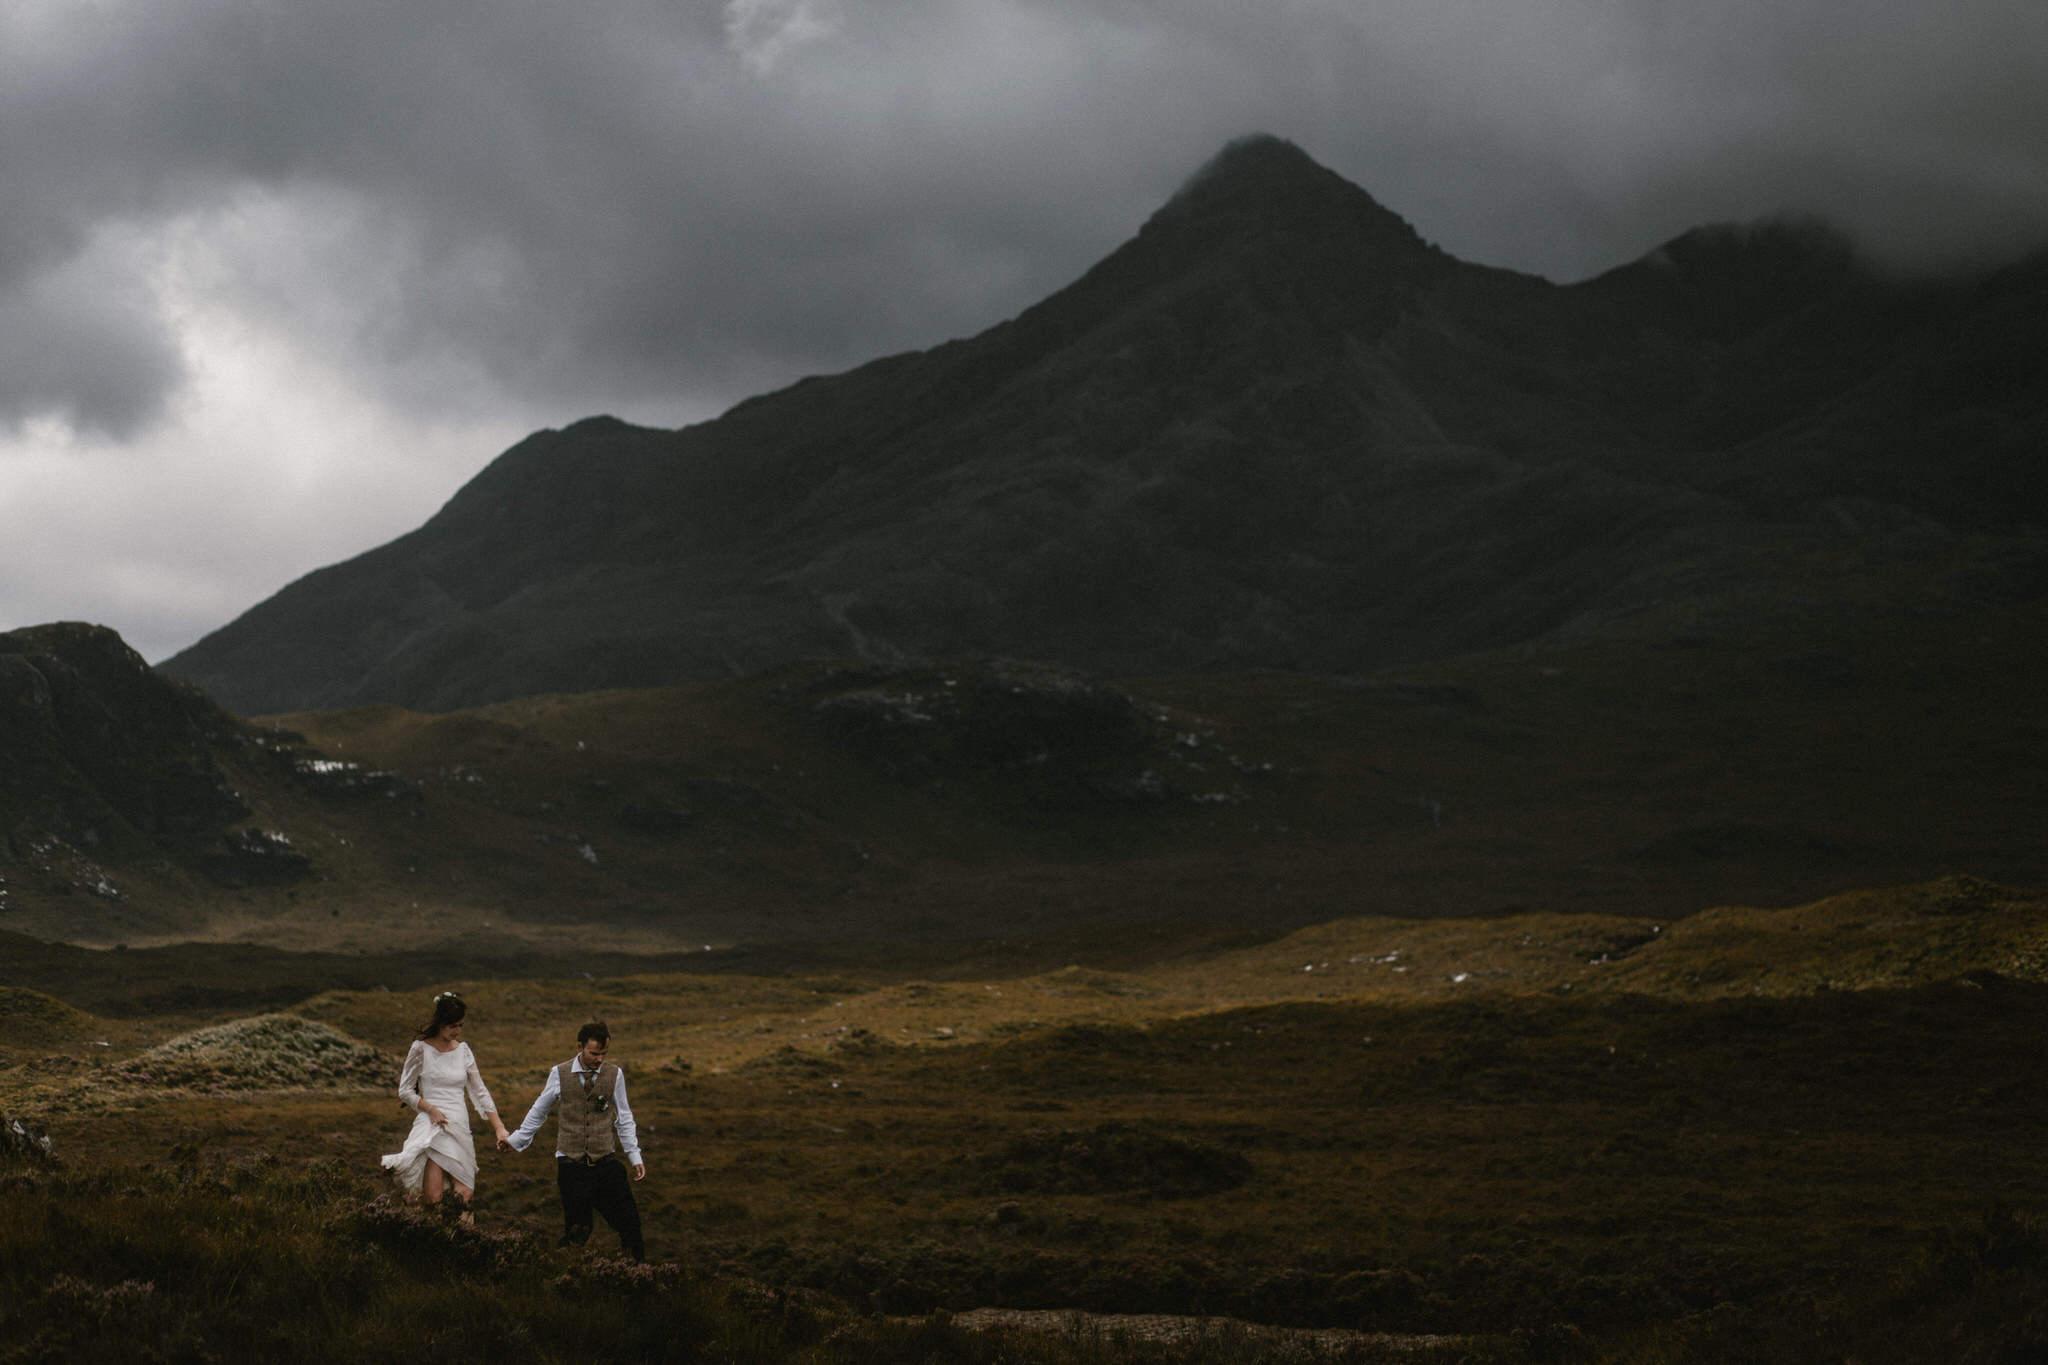 Isle of Skye elopement couple walk through moody mountain scenery